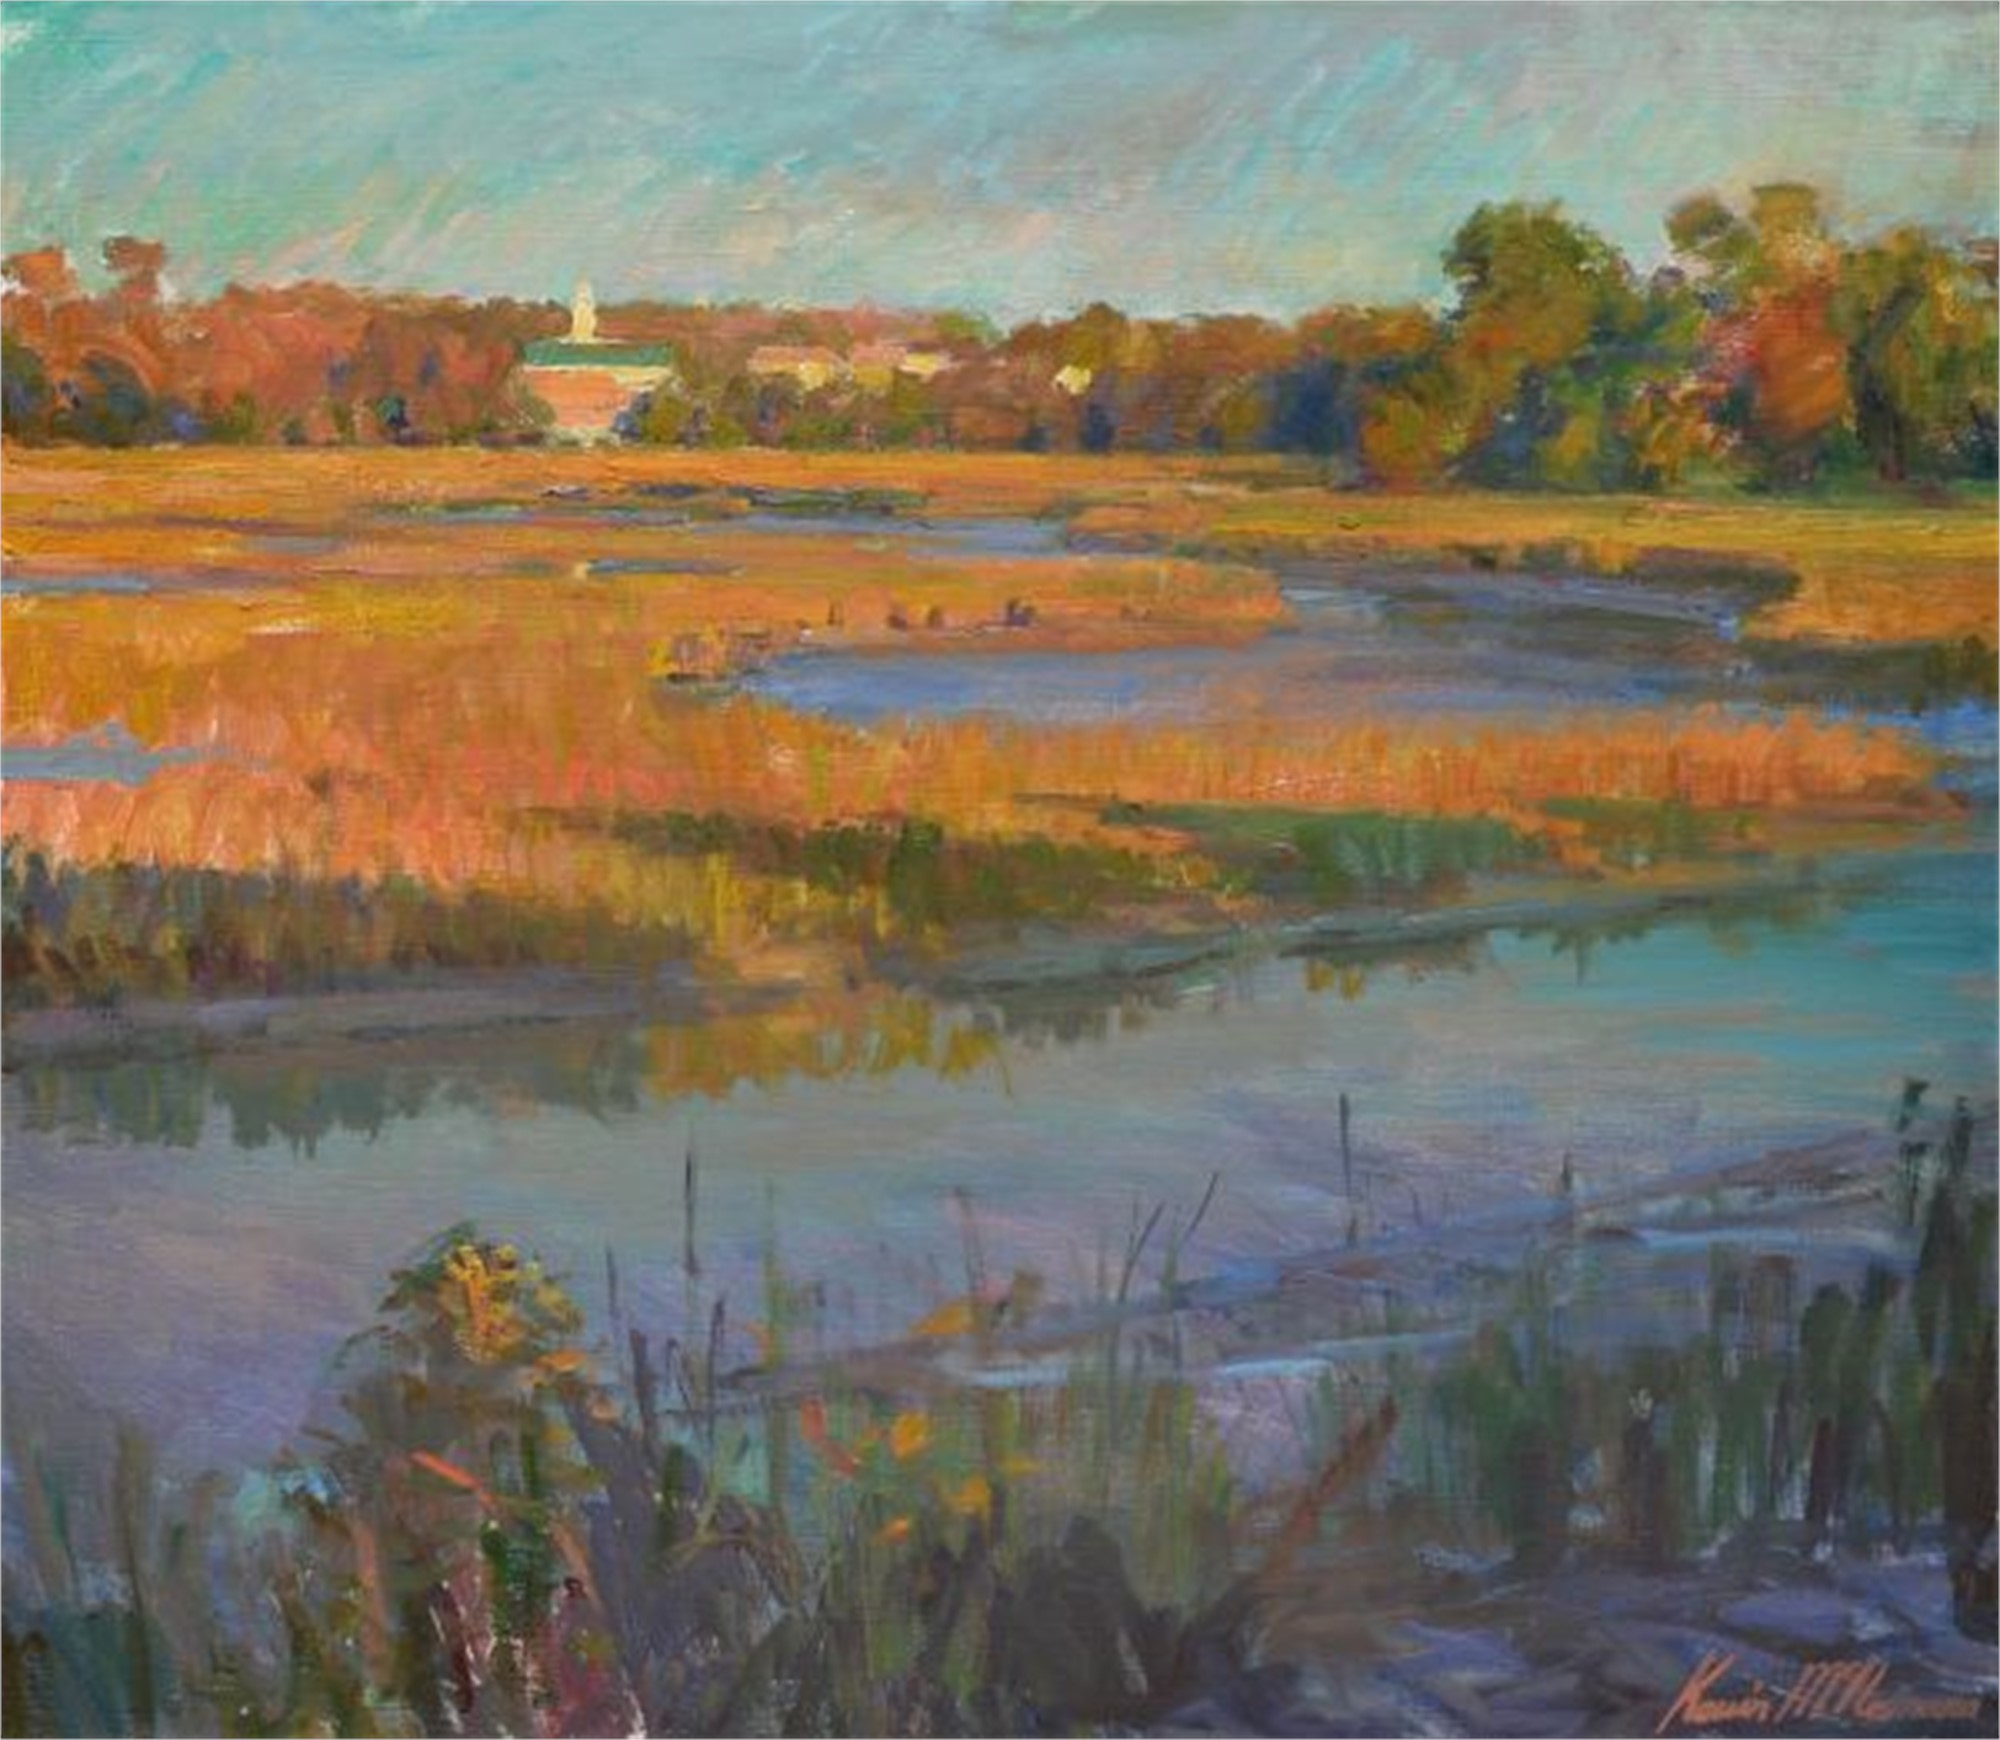 Evening Marsh, South Carolina by Kevin McNamara